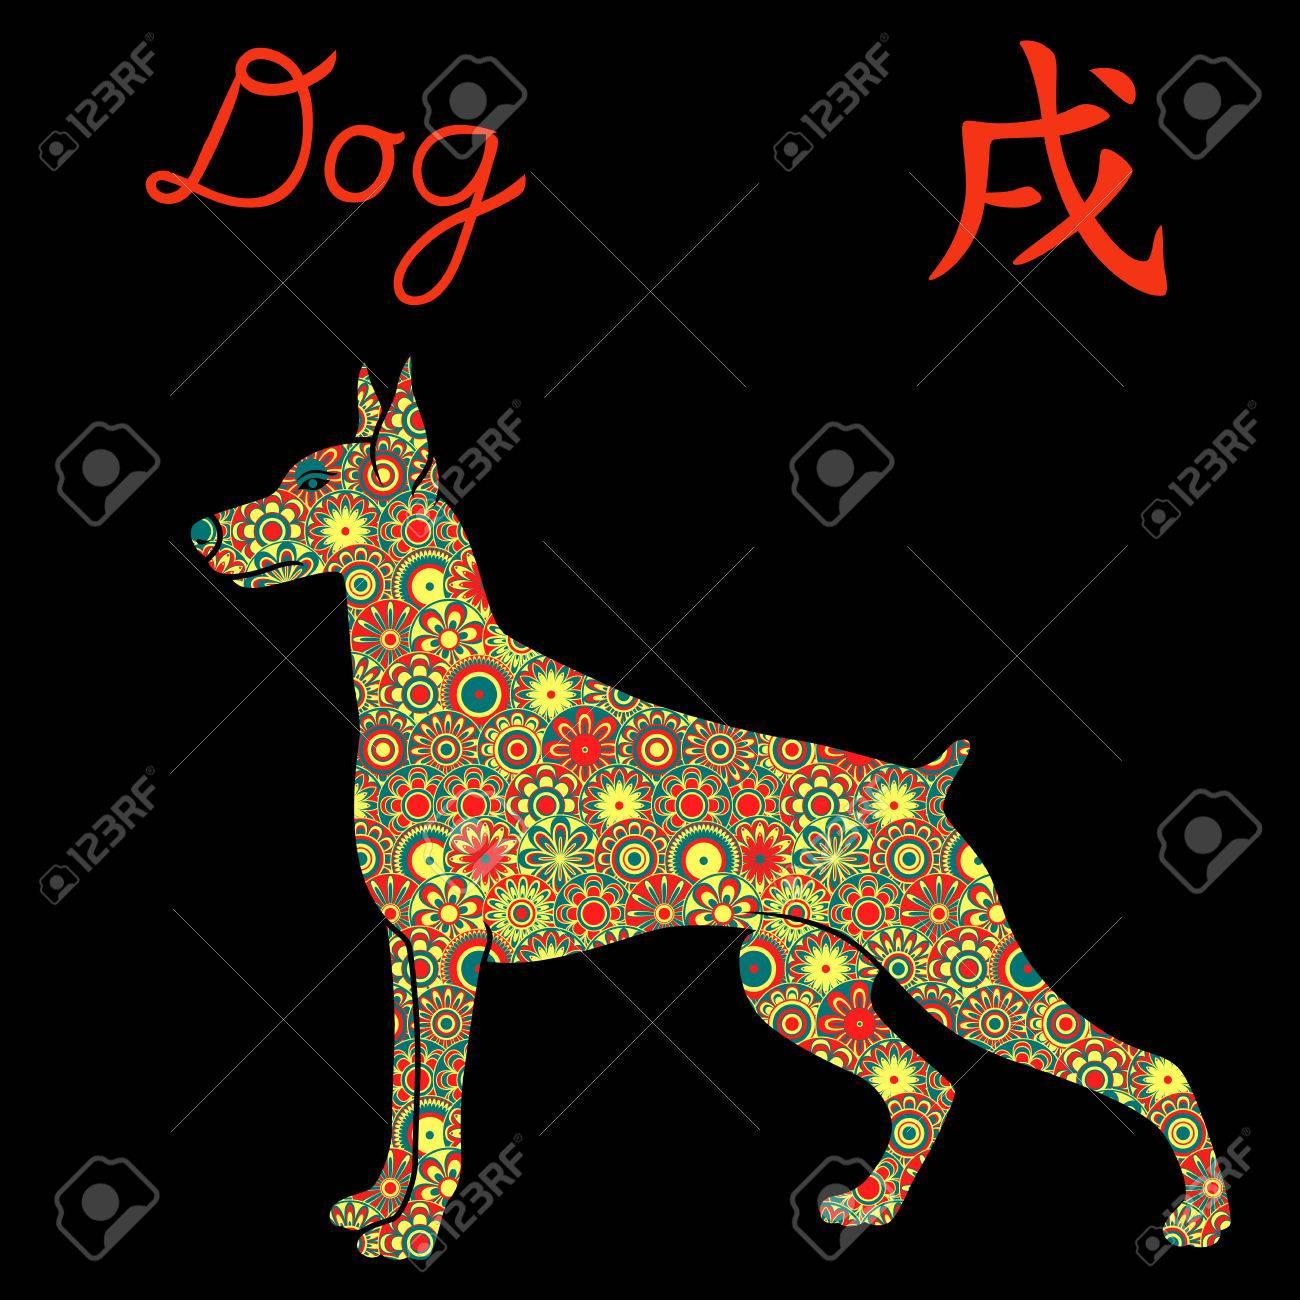 Chinese zodiac sign dog symbol of new year on the eastern chinese zodiac sign dog symbol of new year on the eastern calendar vector stencil buycottarizona Images